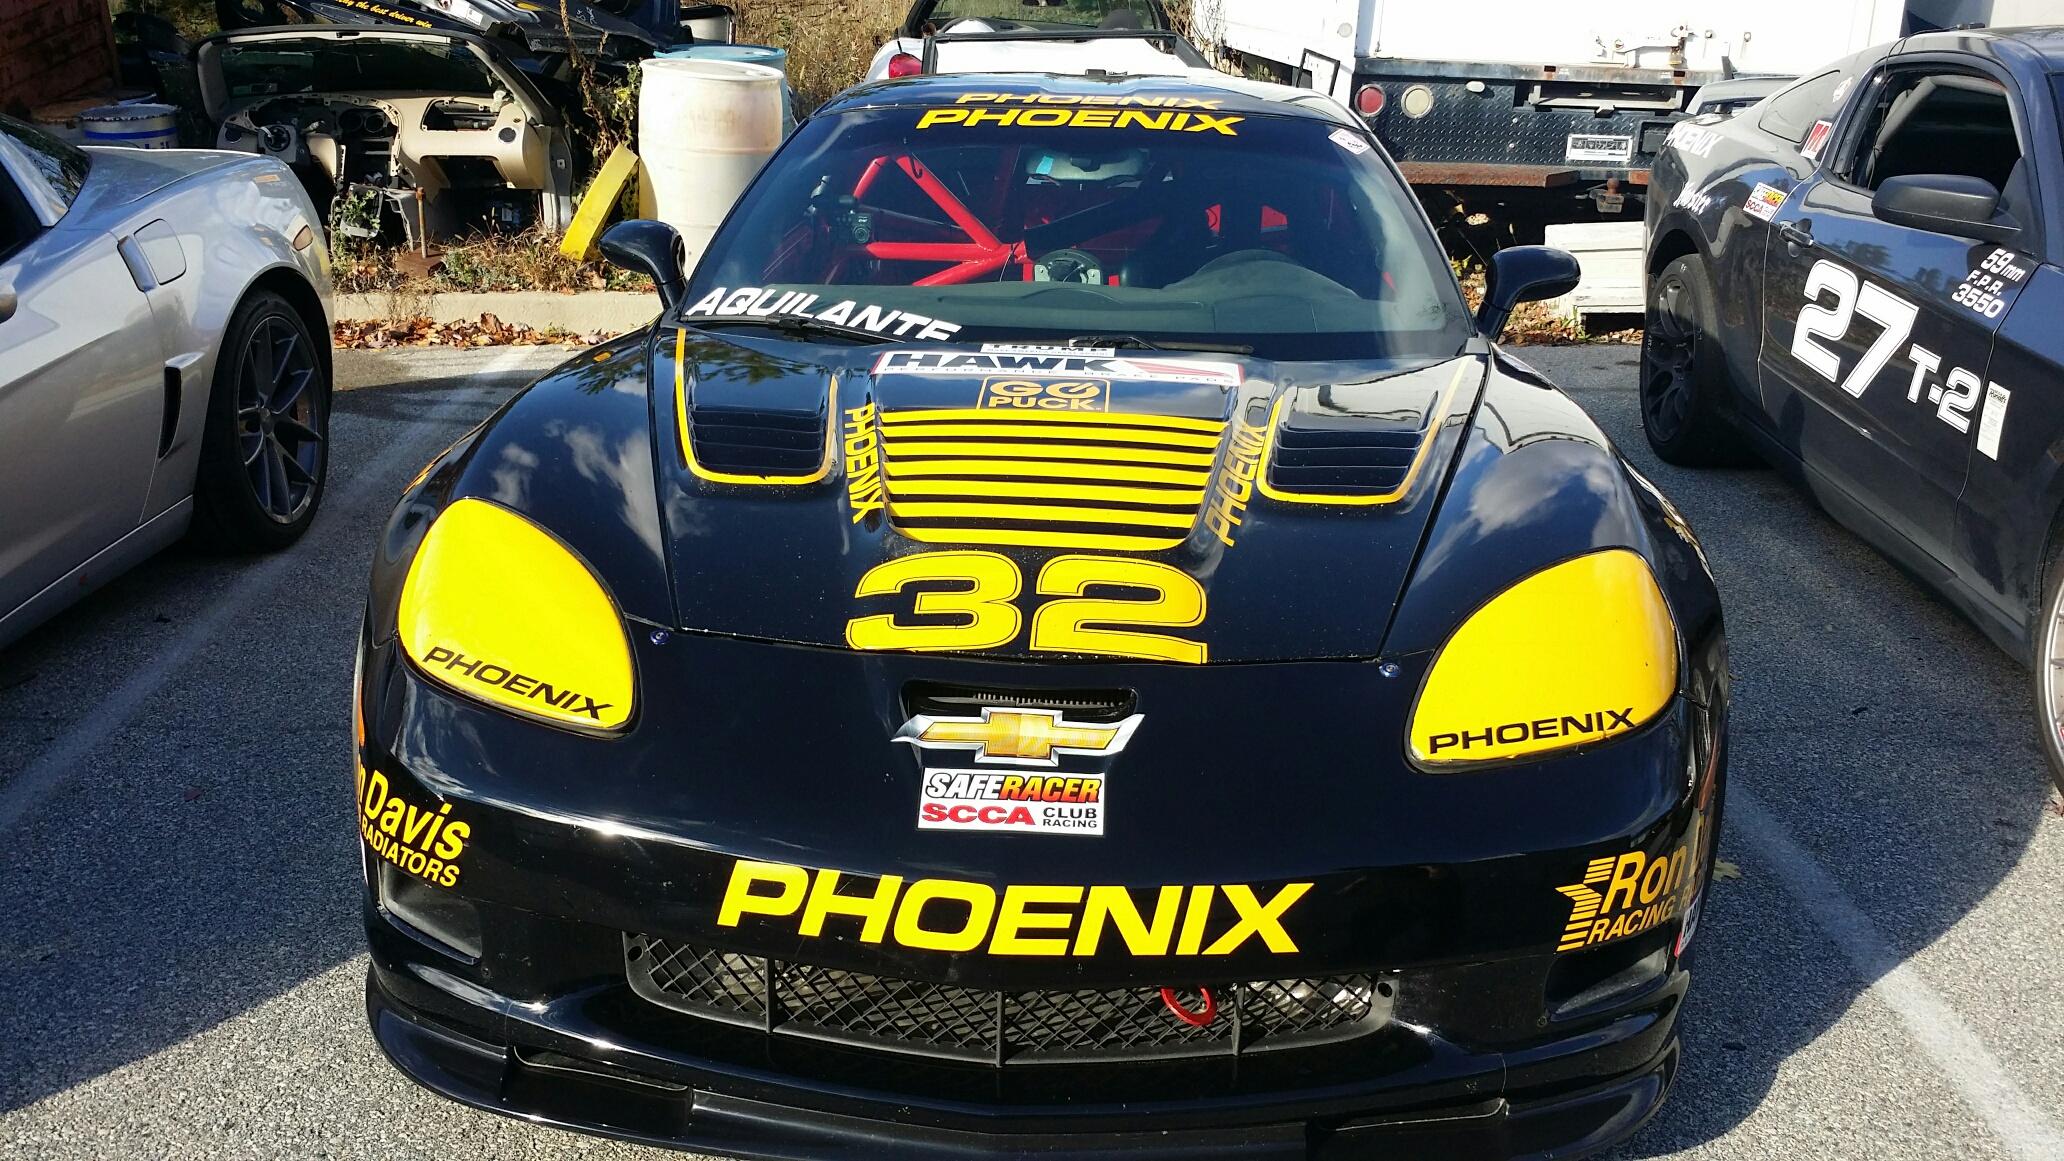 Phoenix Cars for Sale